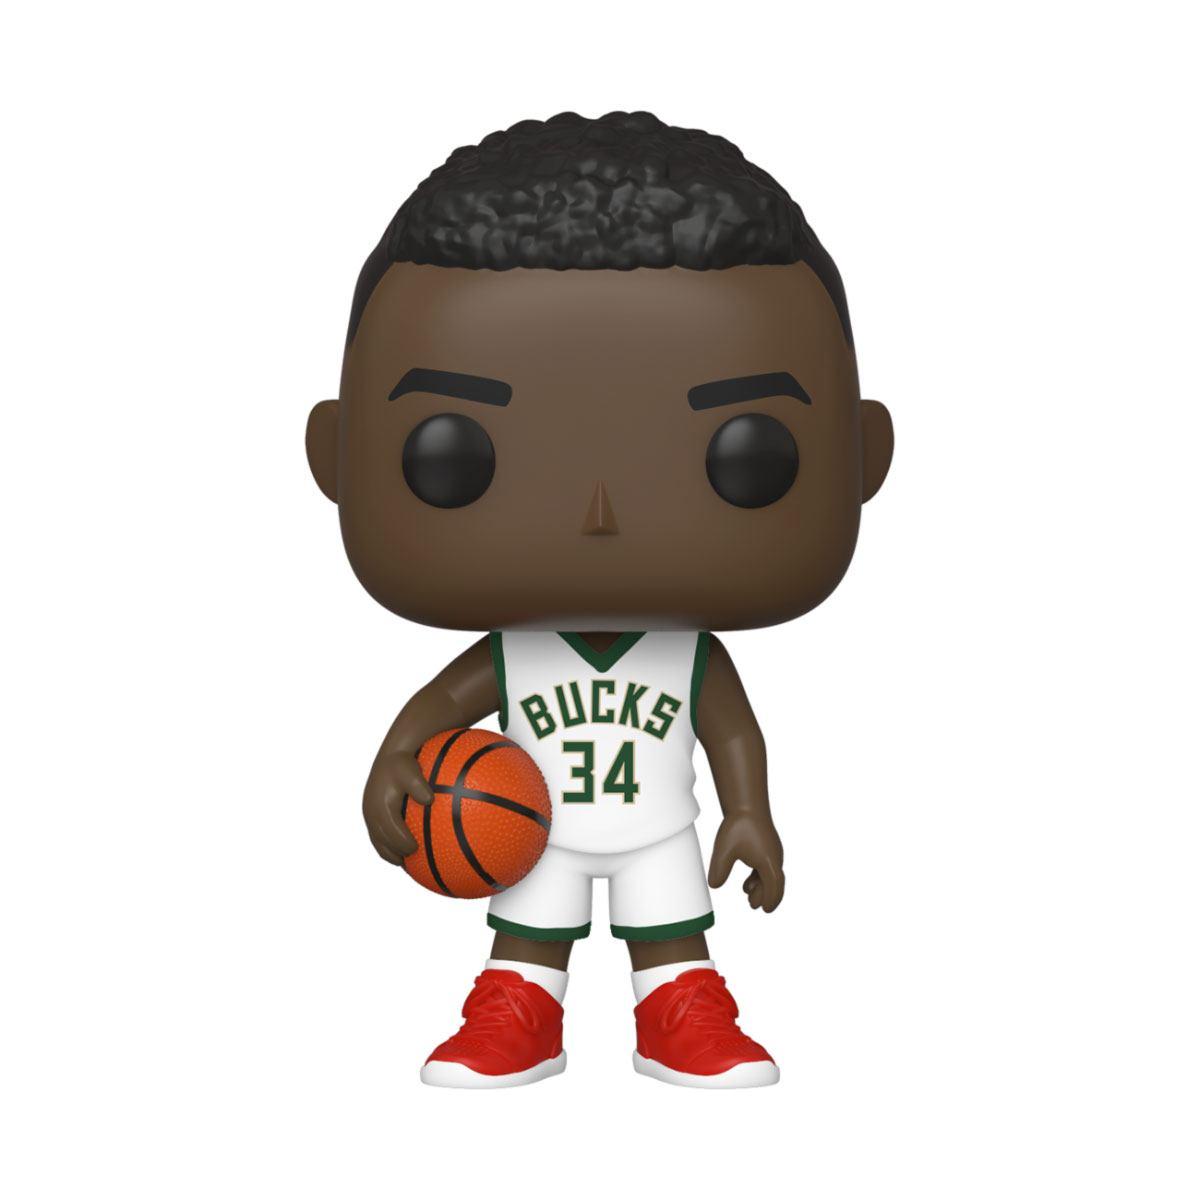 NBA POP! Sports Vinyl Figure Giannis Antetokounmpo (Bucks) 9 cm